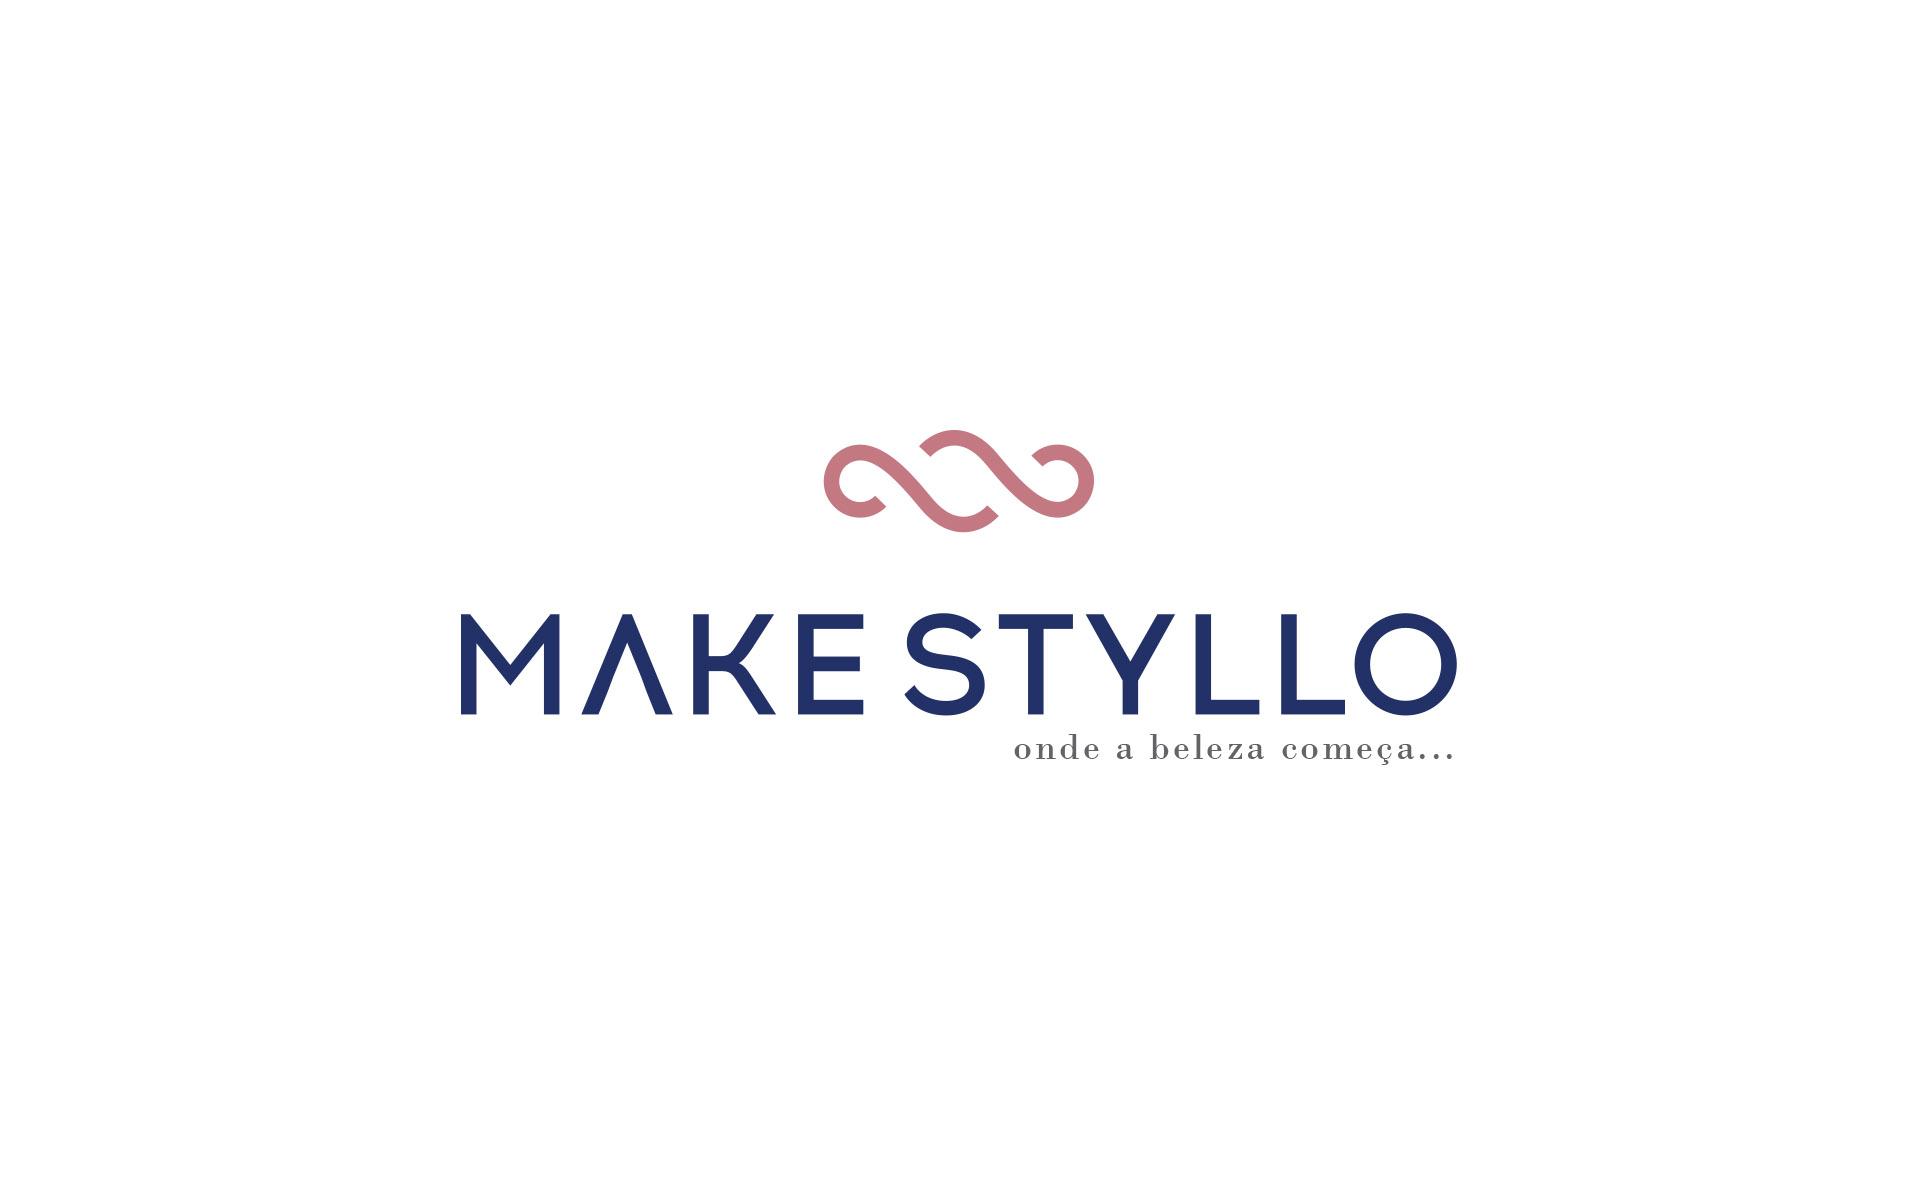 Depois make stillo Make Stillo 16 6 1